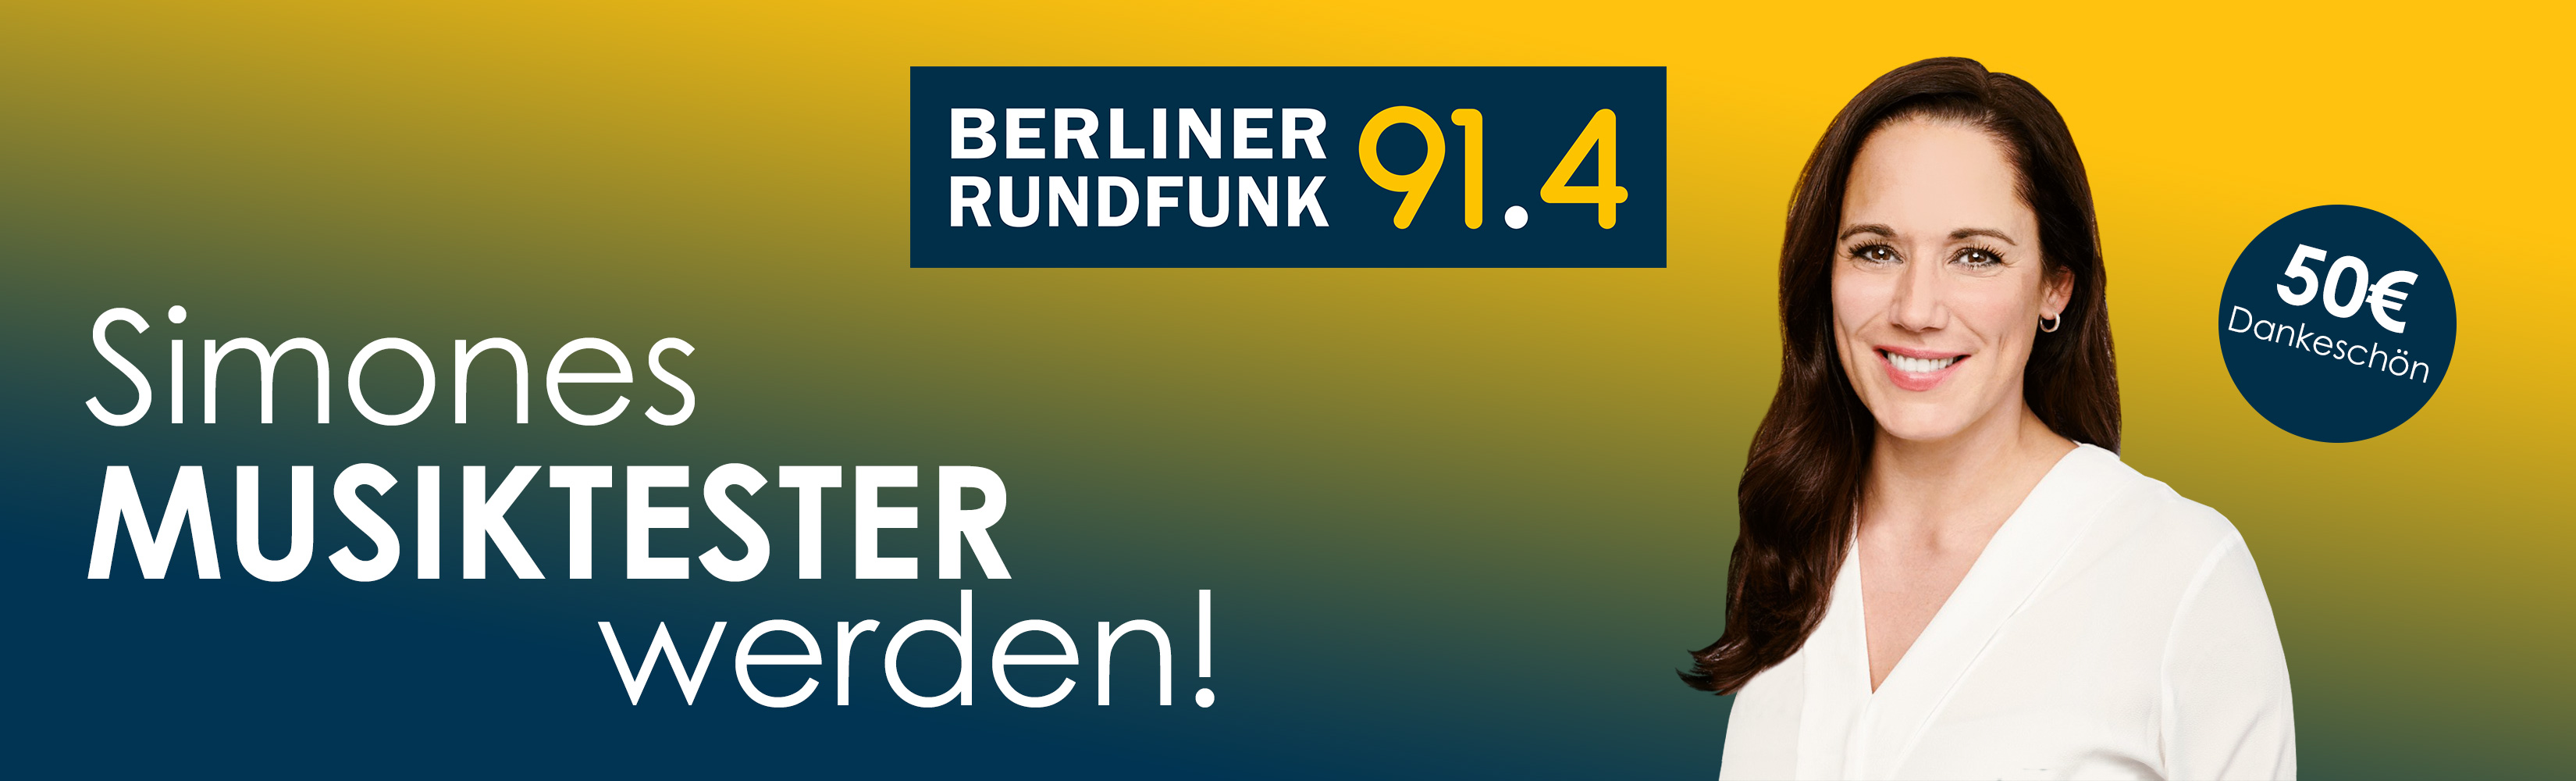 Berliner Rundfunk 91.4 Musikumfrage